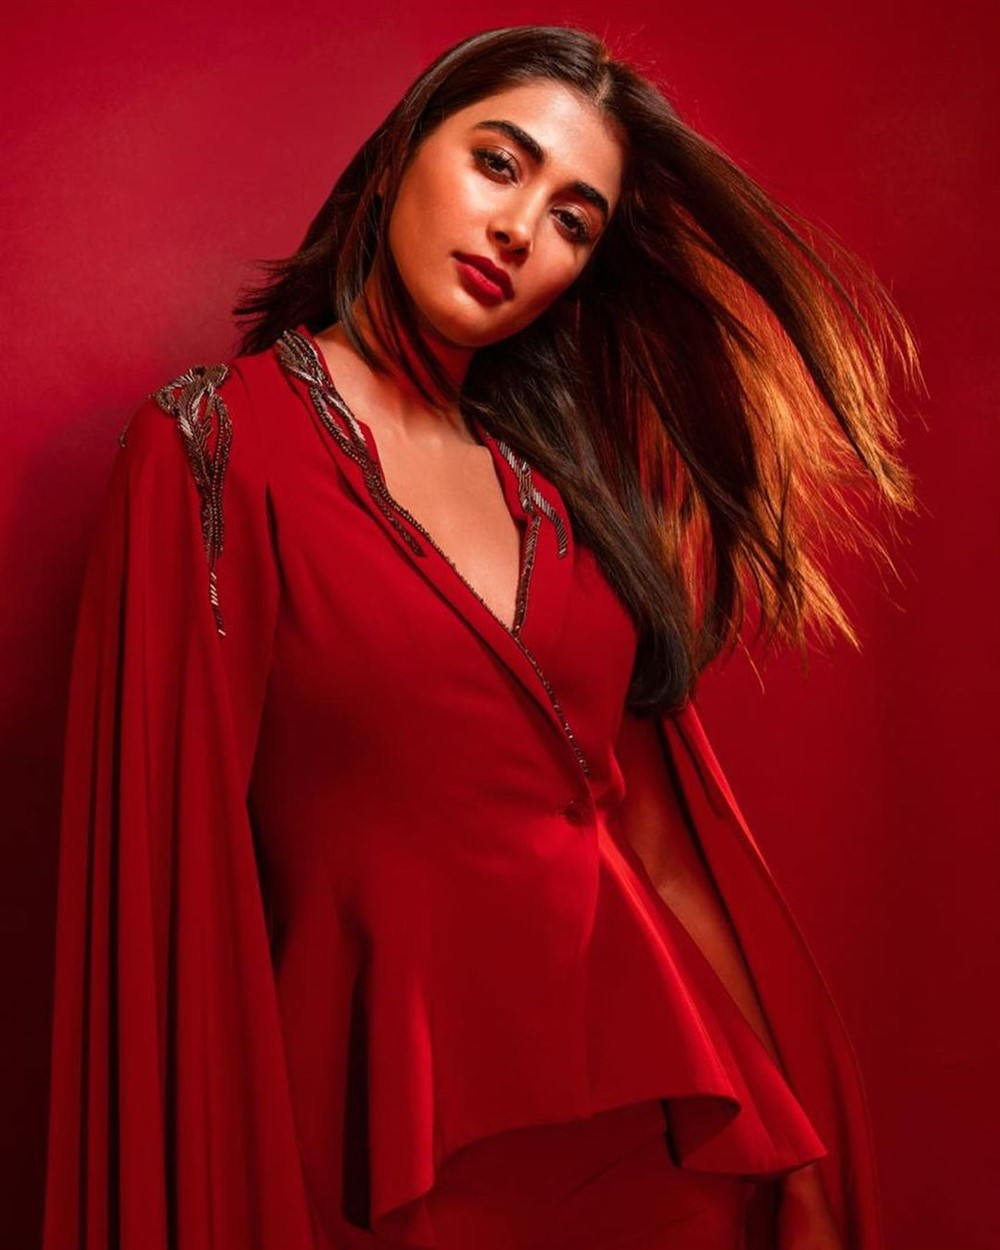 Telugu Actress Pooja Hegde New Photoshoot Pictures